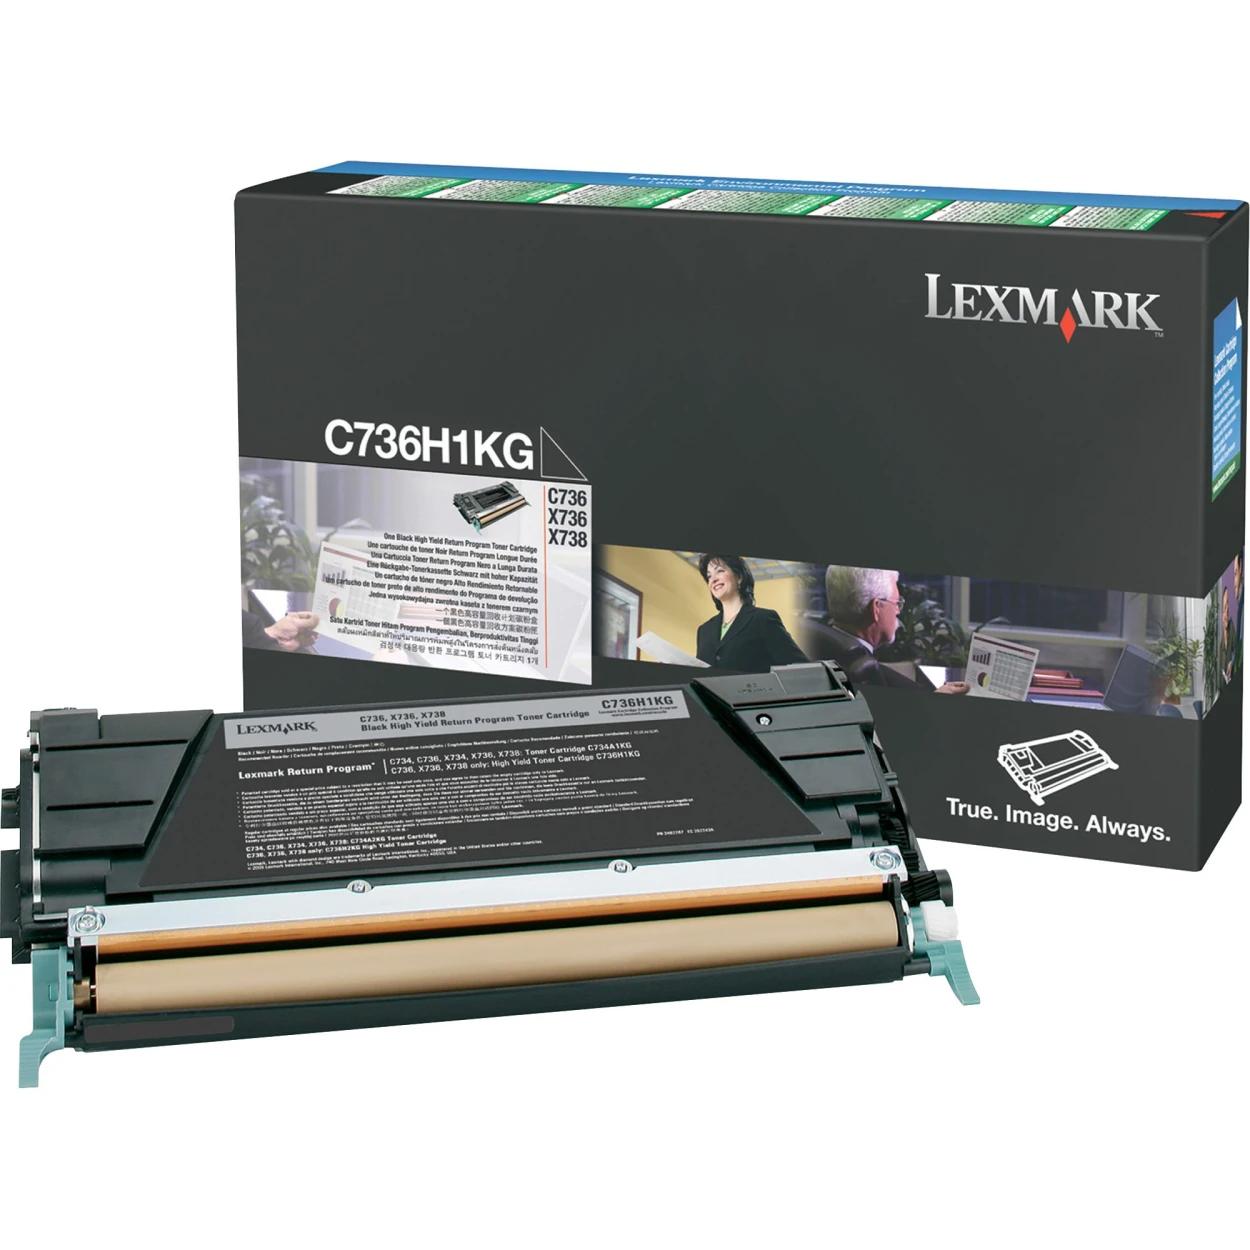 Original Lexmark C736H1KG *RP High-Yield Laser Toner Cartridge  Black